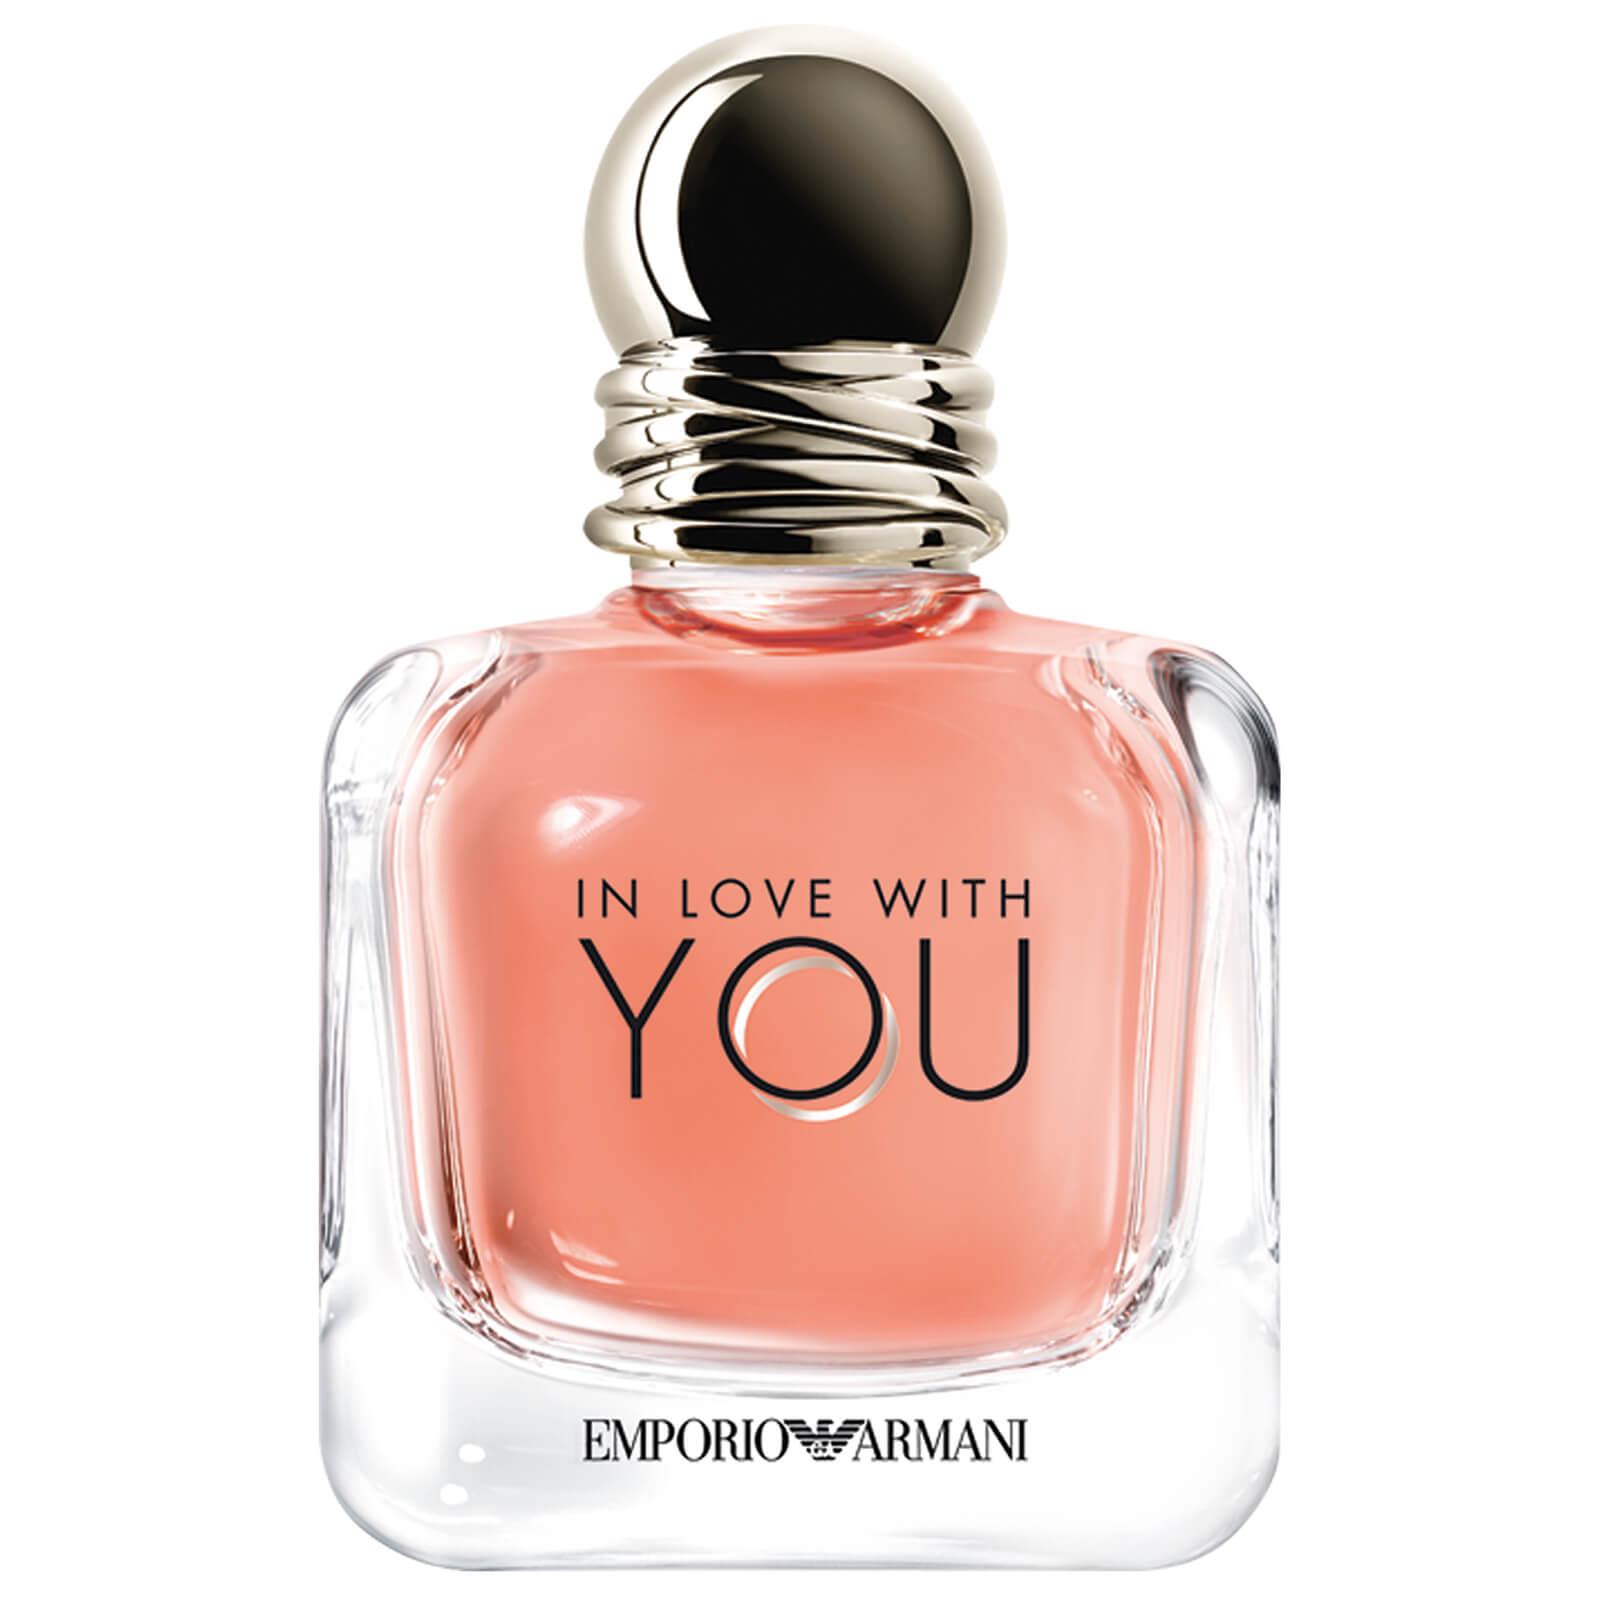 fcb9b2e5ea6 Emporio Armani In Love with You Eau de Parfum (Various Sizes)